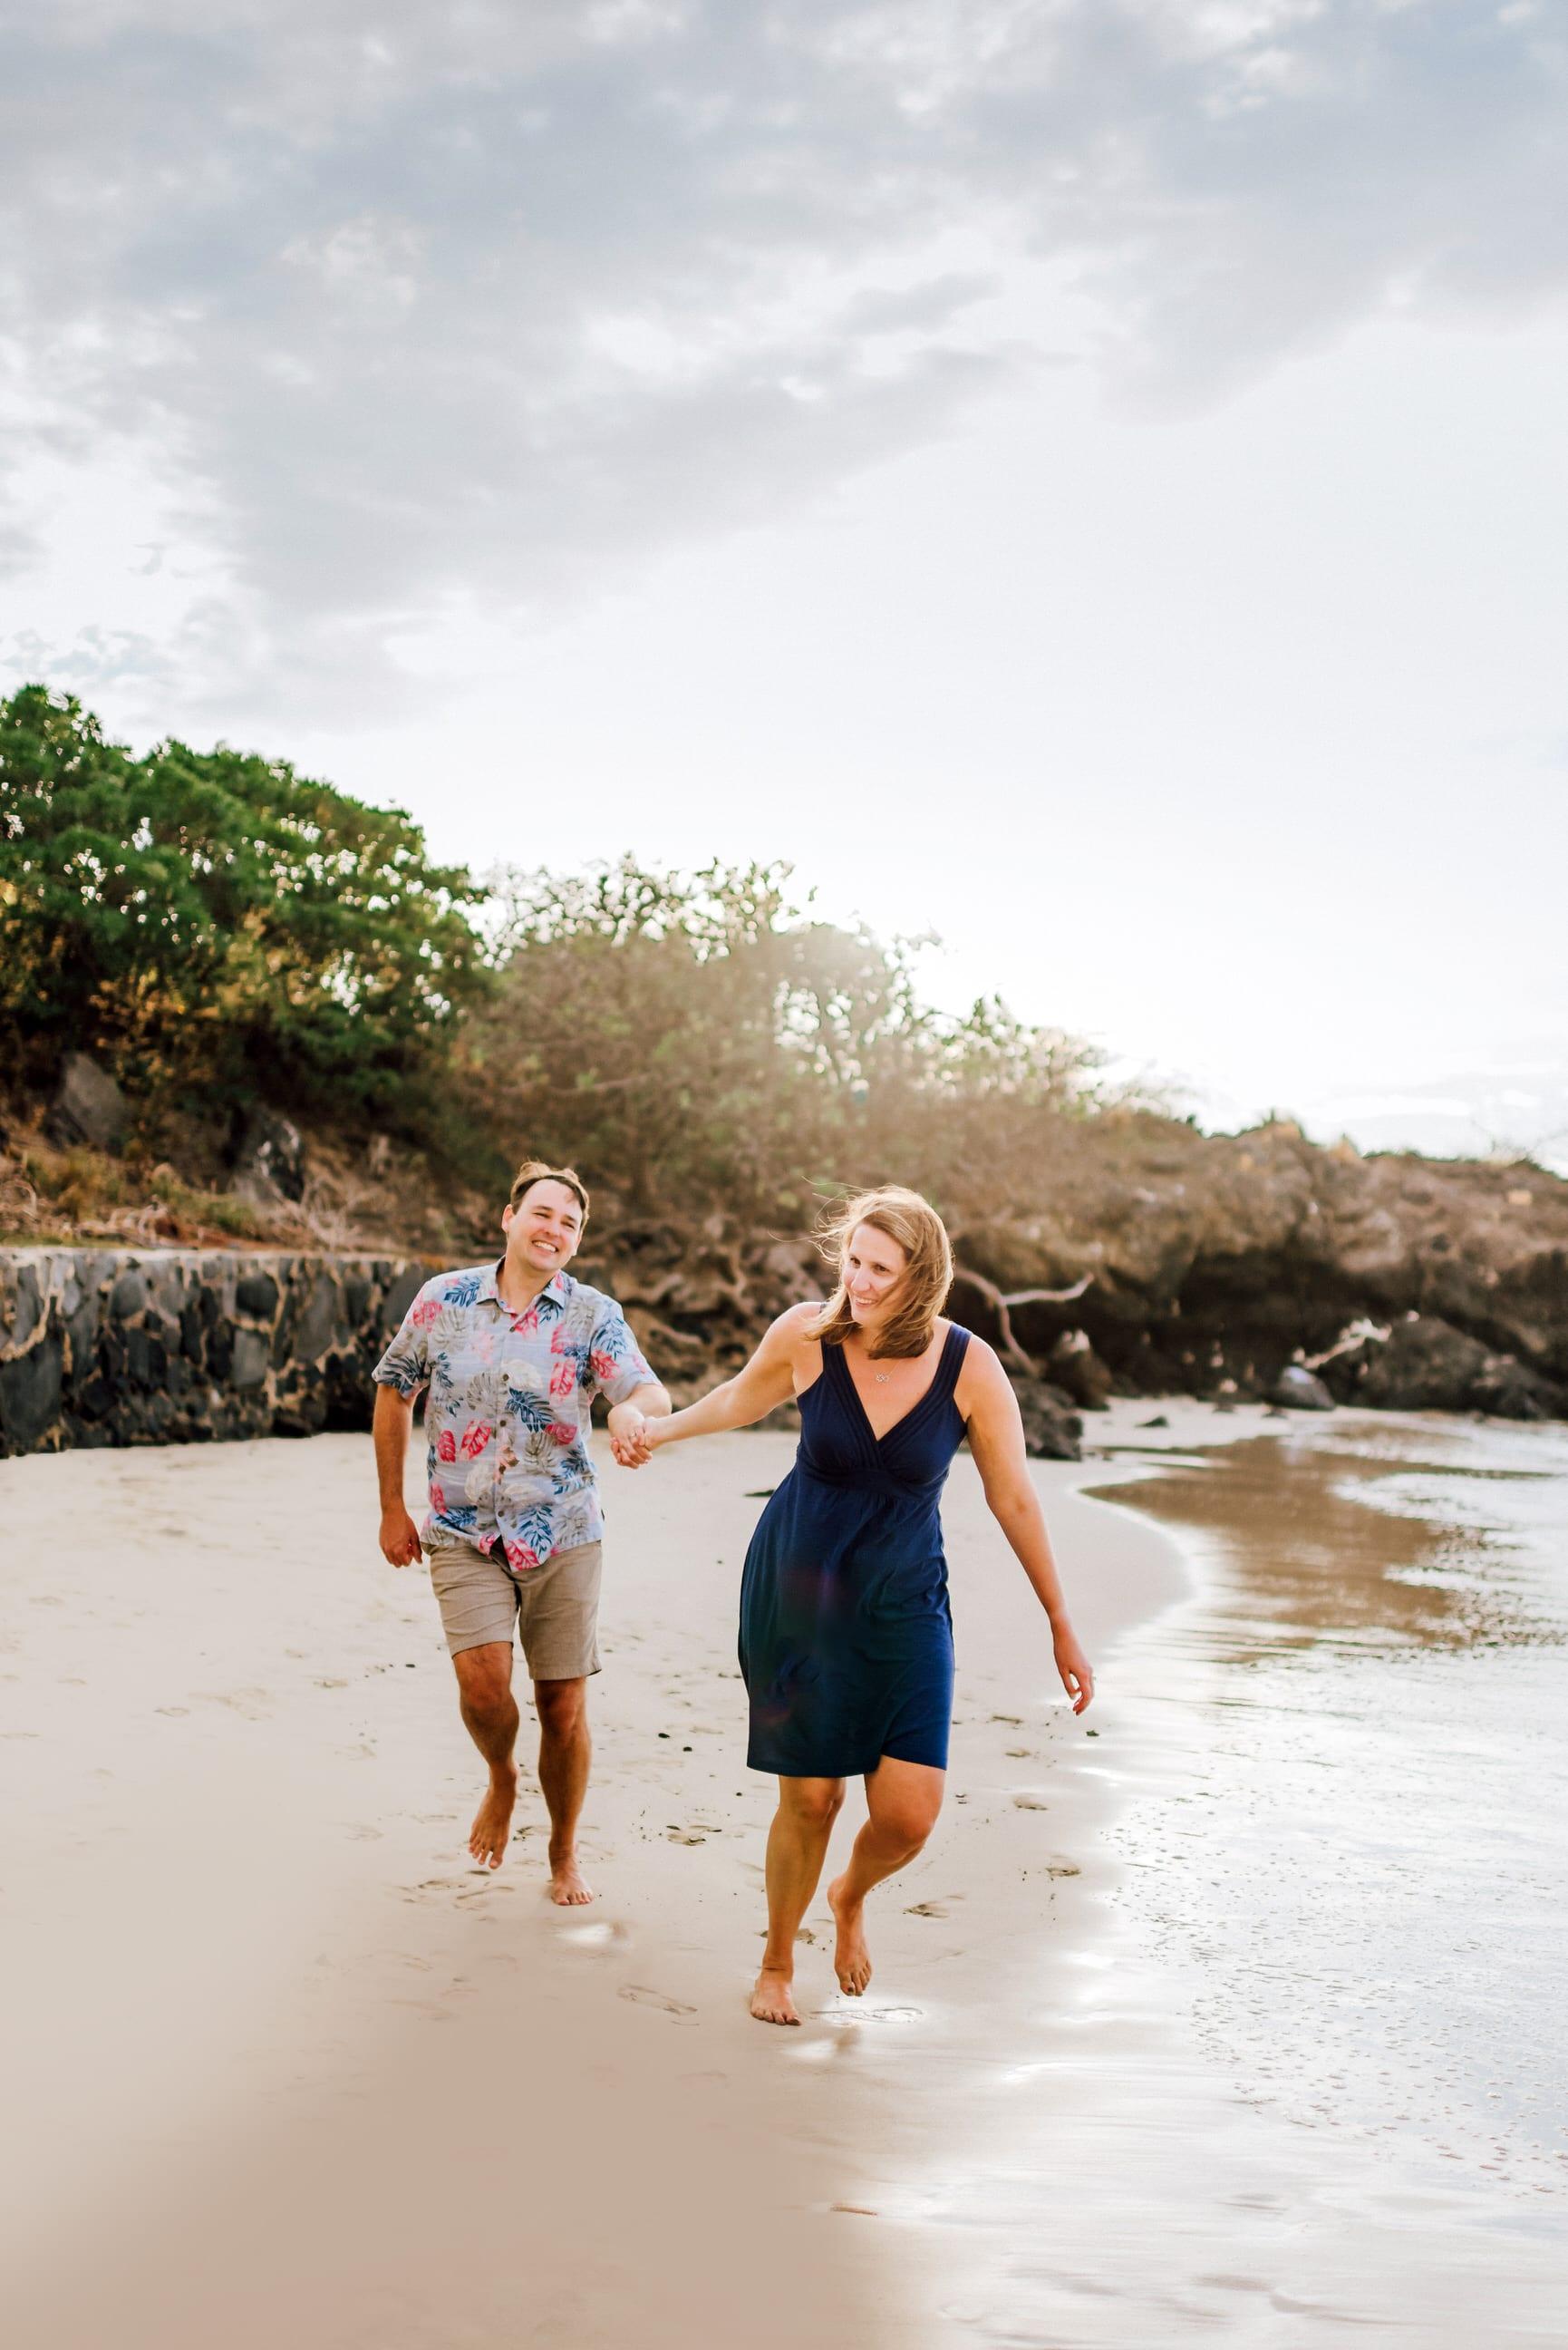 Family-Pictures-Hawaii-Mauna-Kea-Beach-6.jpg